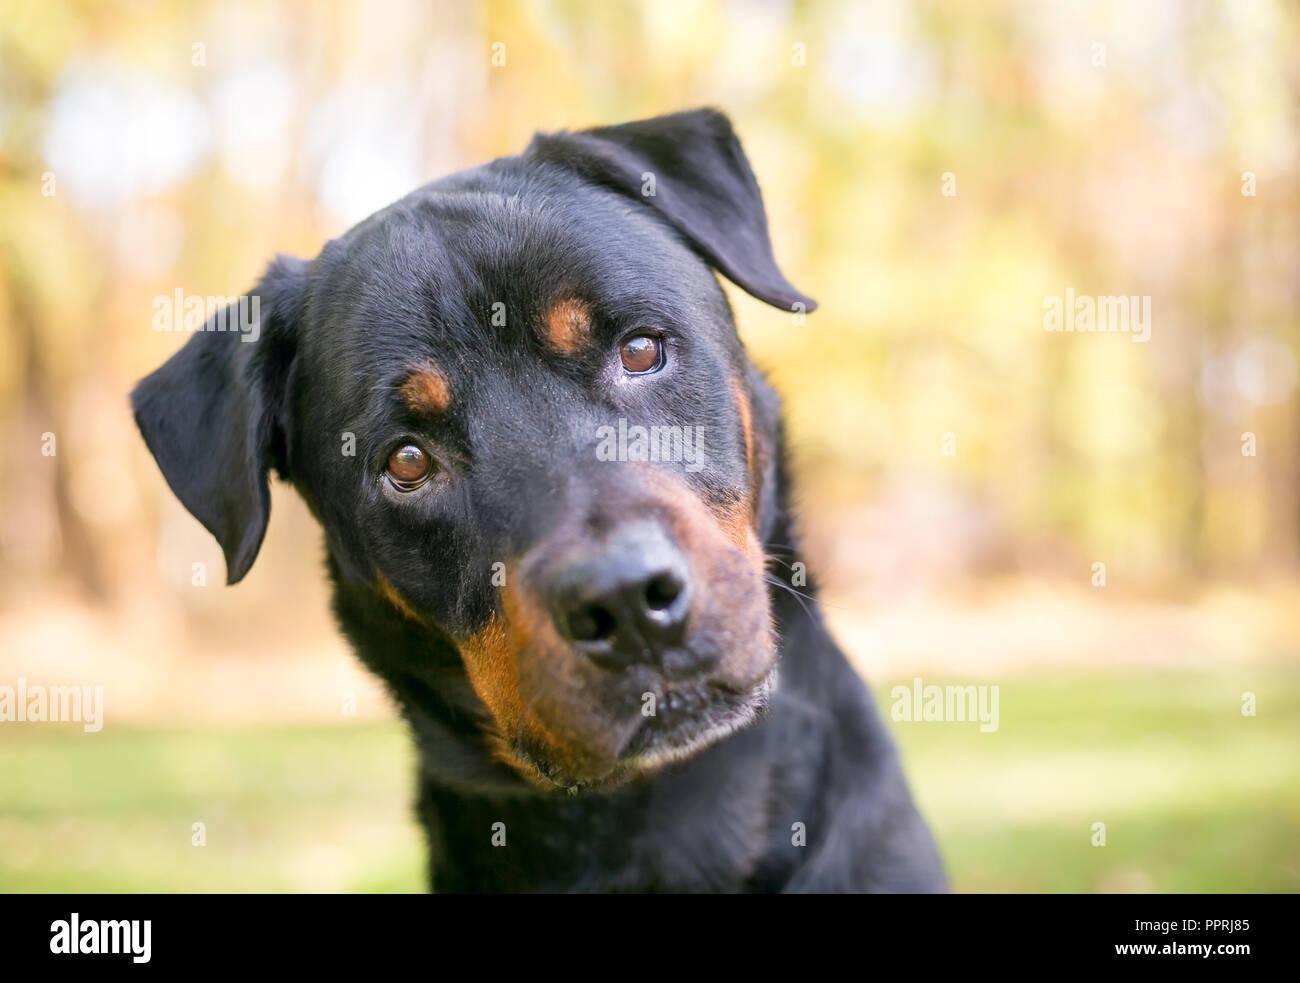 A Rottweiler dog outdoors listening with a head tilt - Stock Image